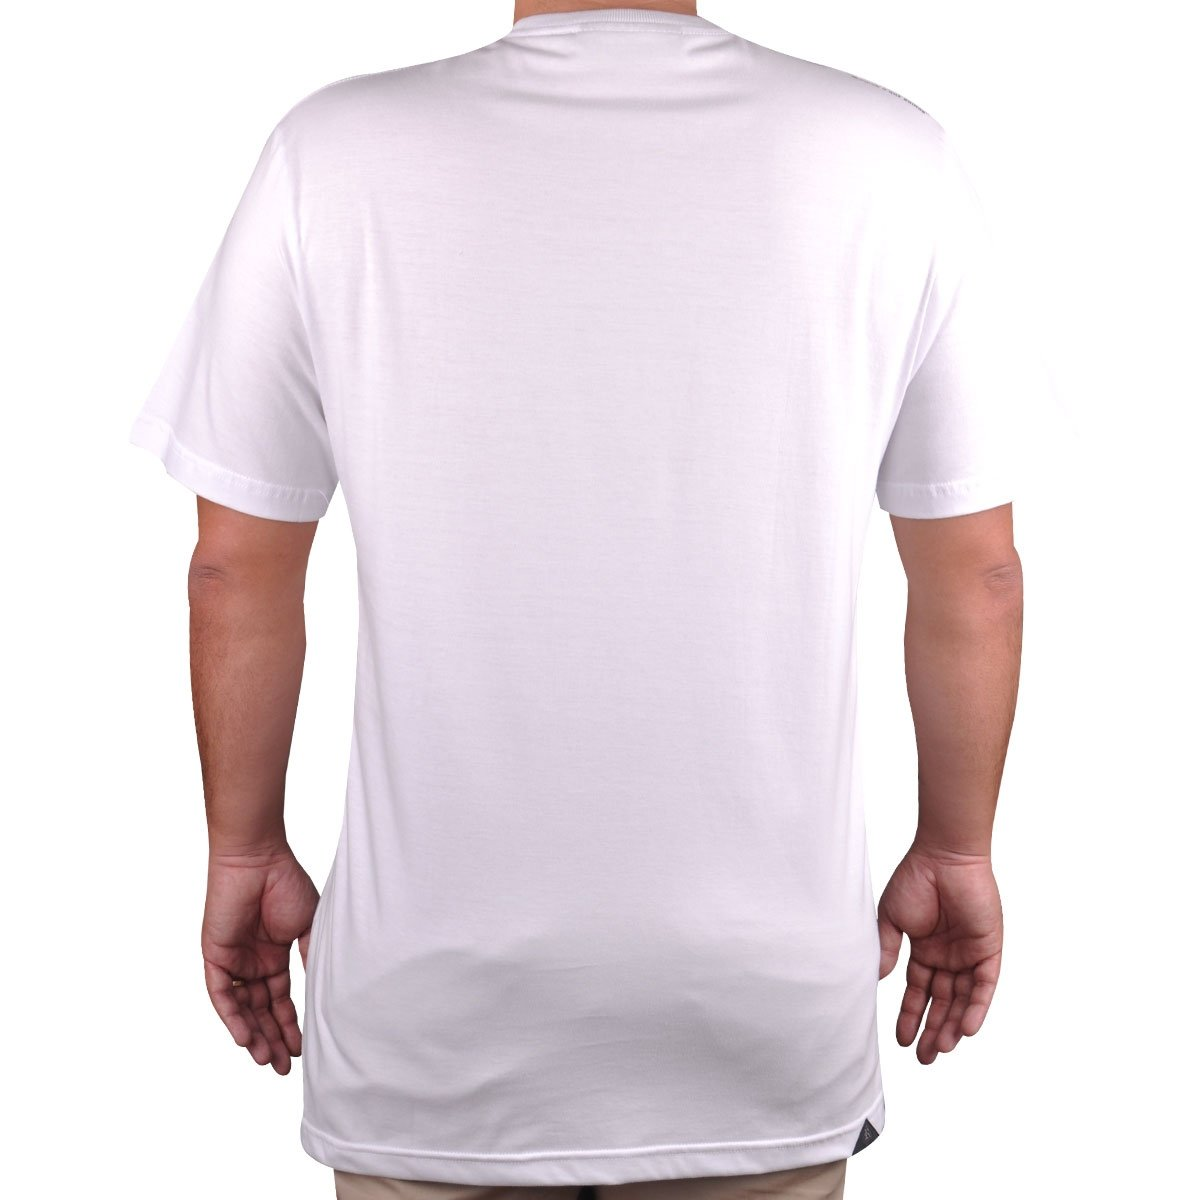 Camiseta Mcd Racionais Iv  Camiseta Mcd Racionais Iv ... 1c2a3cfcb33